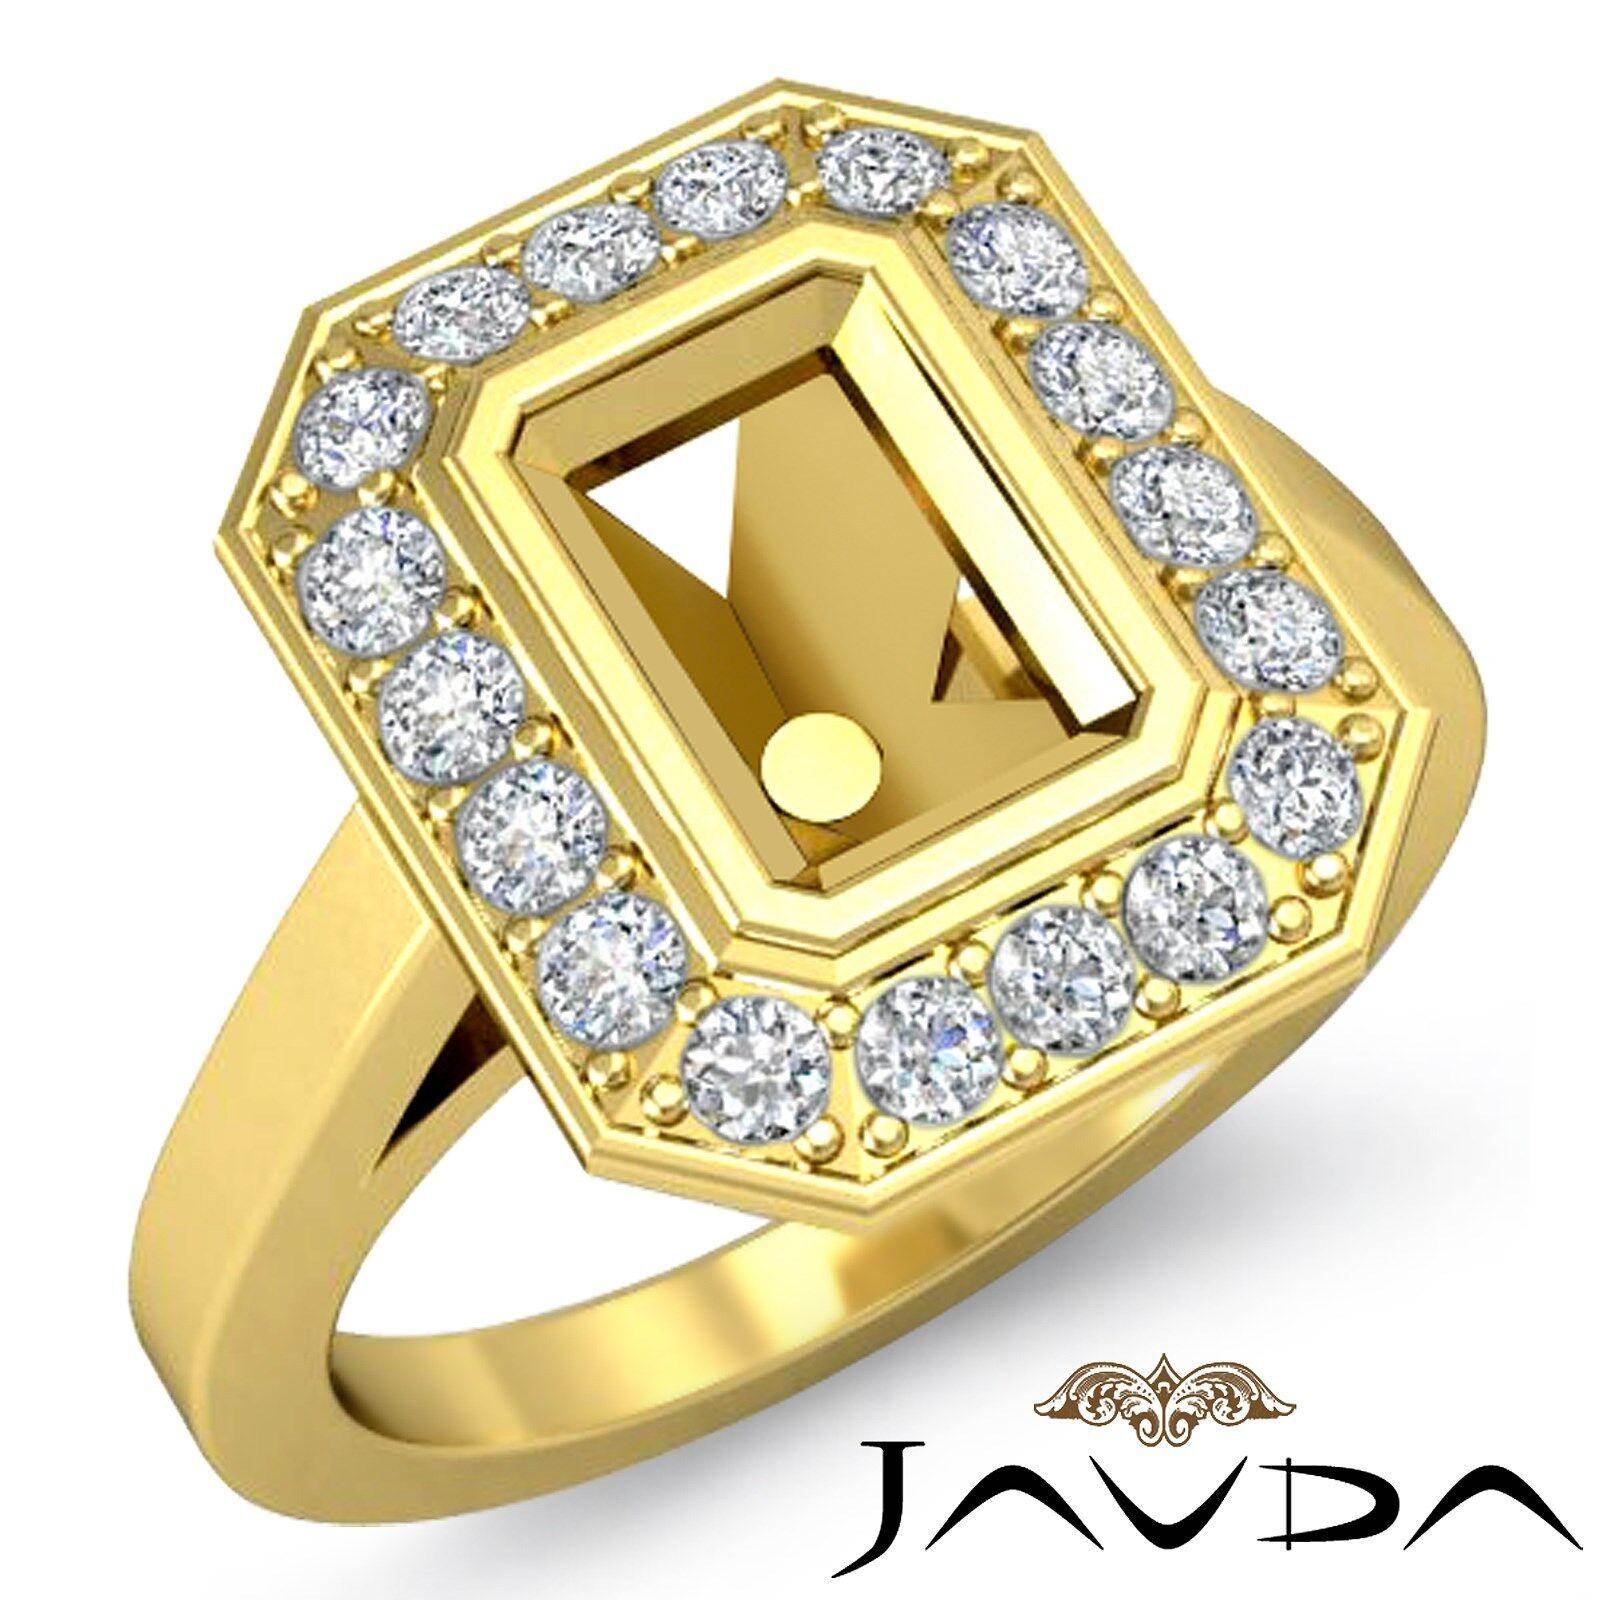 Halo Bezel Diamond 18k Yellow gold Engagement Emerald Cut 0.3Ct Semi Mount Ring